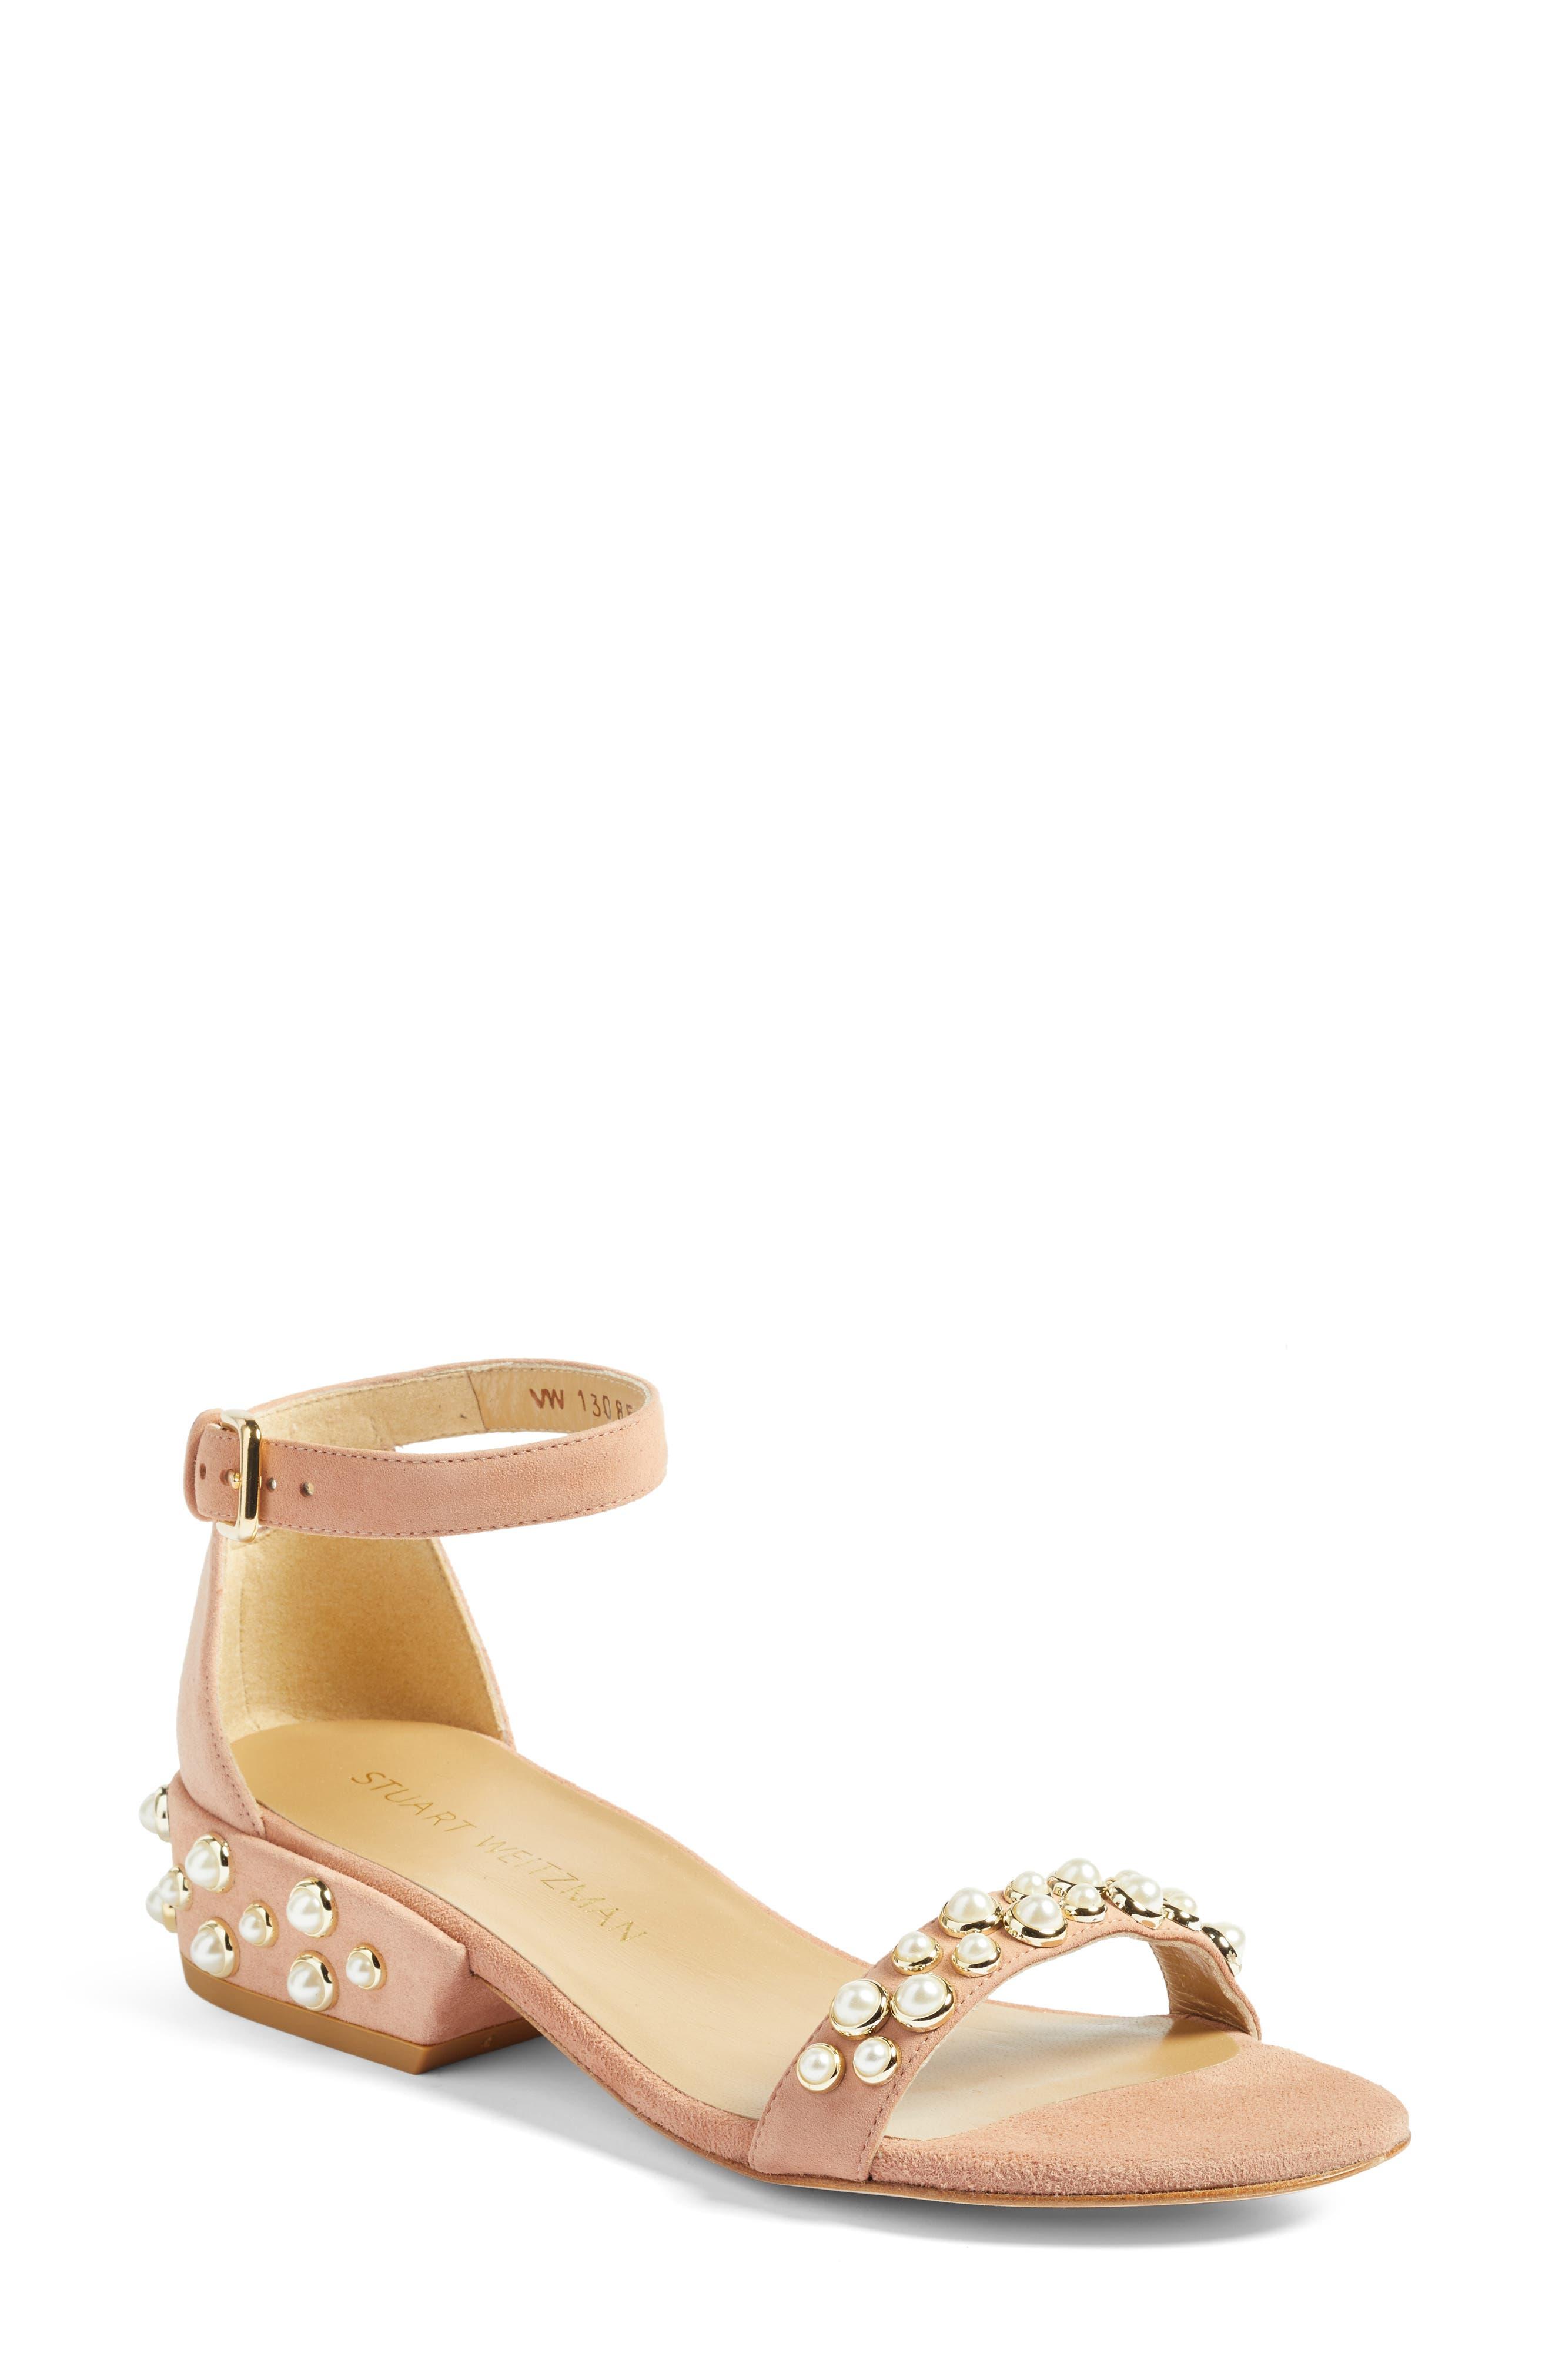 Main Image - Stuart Weitzman Allpearls Ankle Strap Sandal (Women)